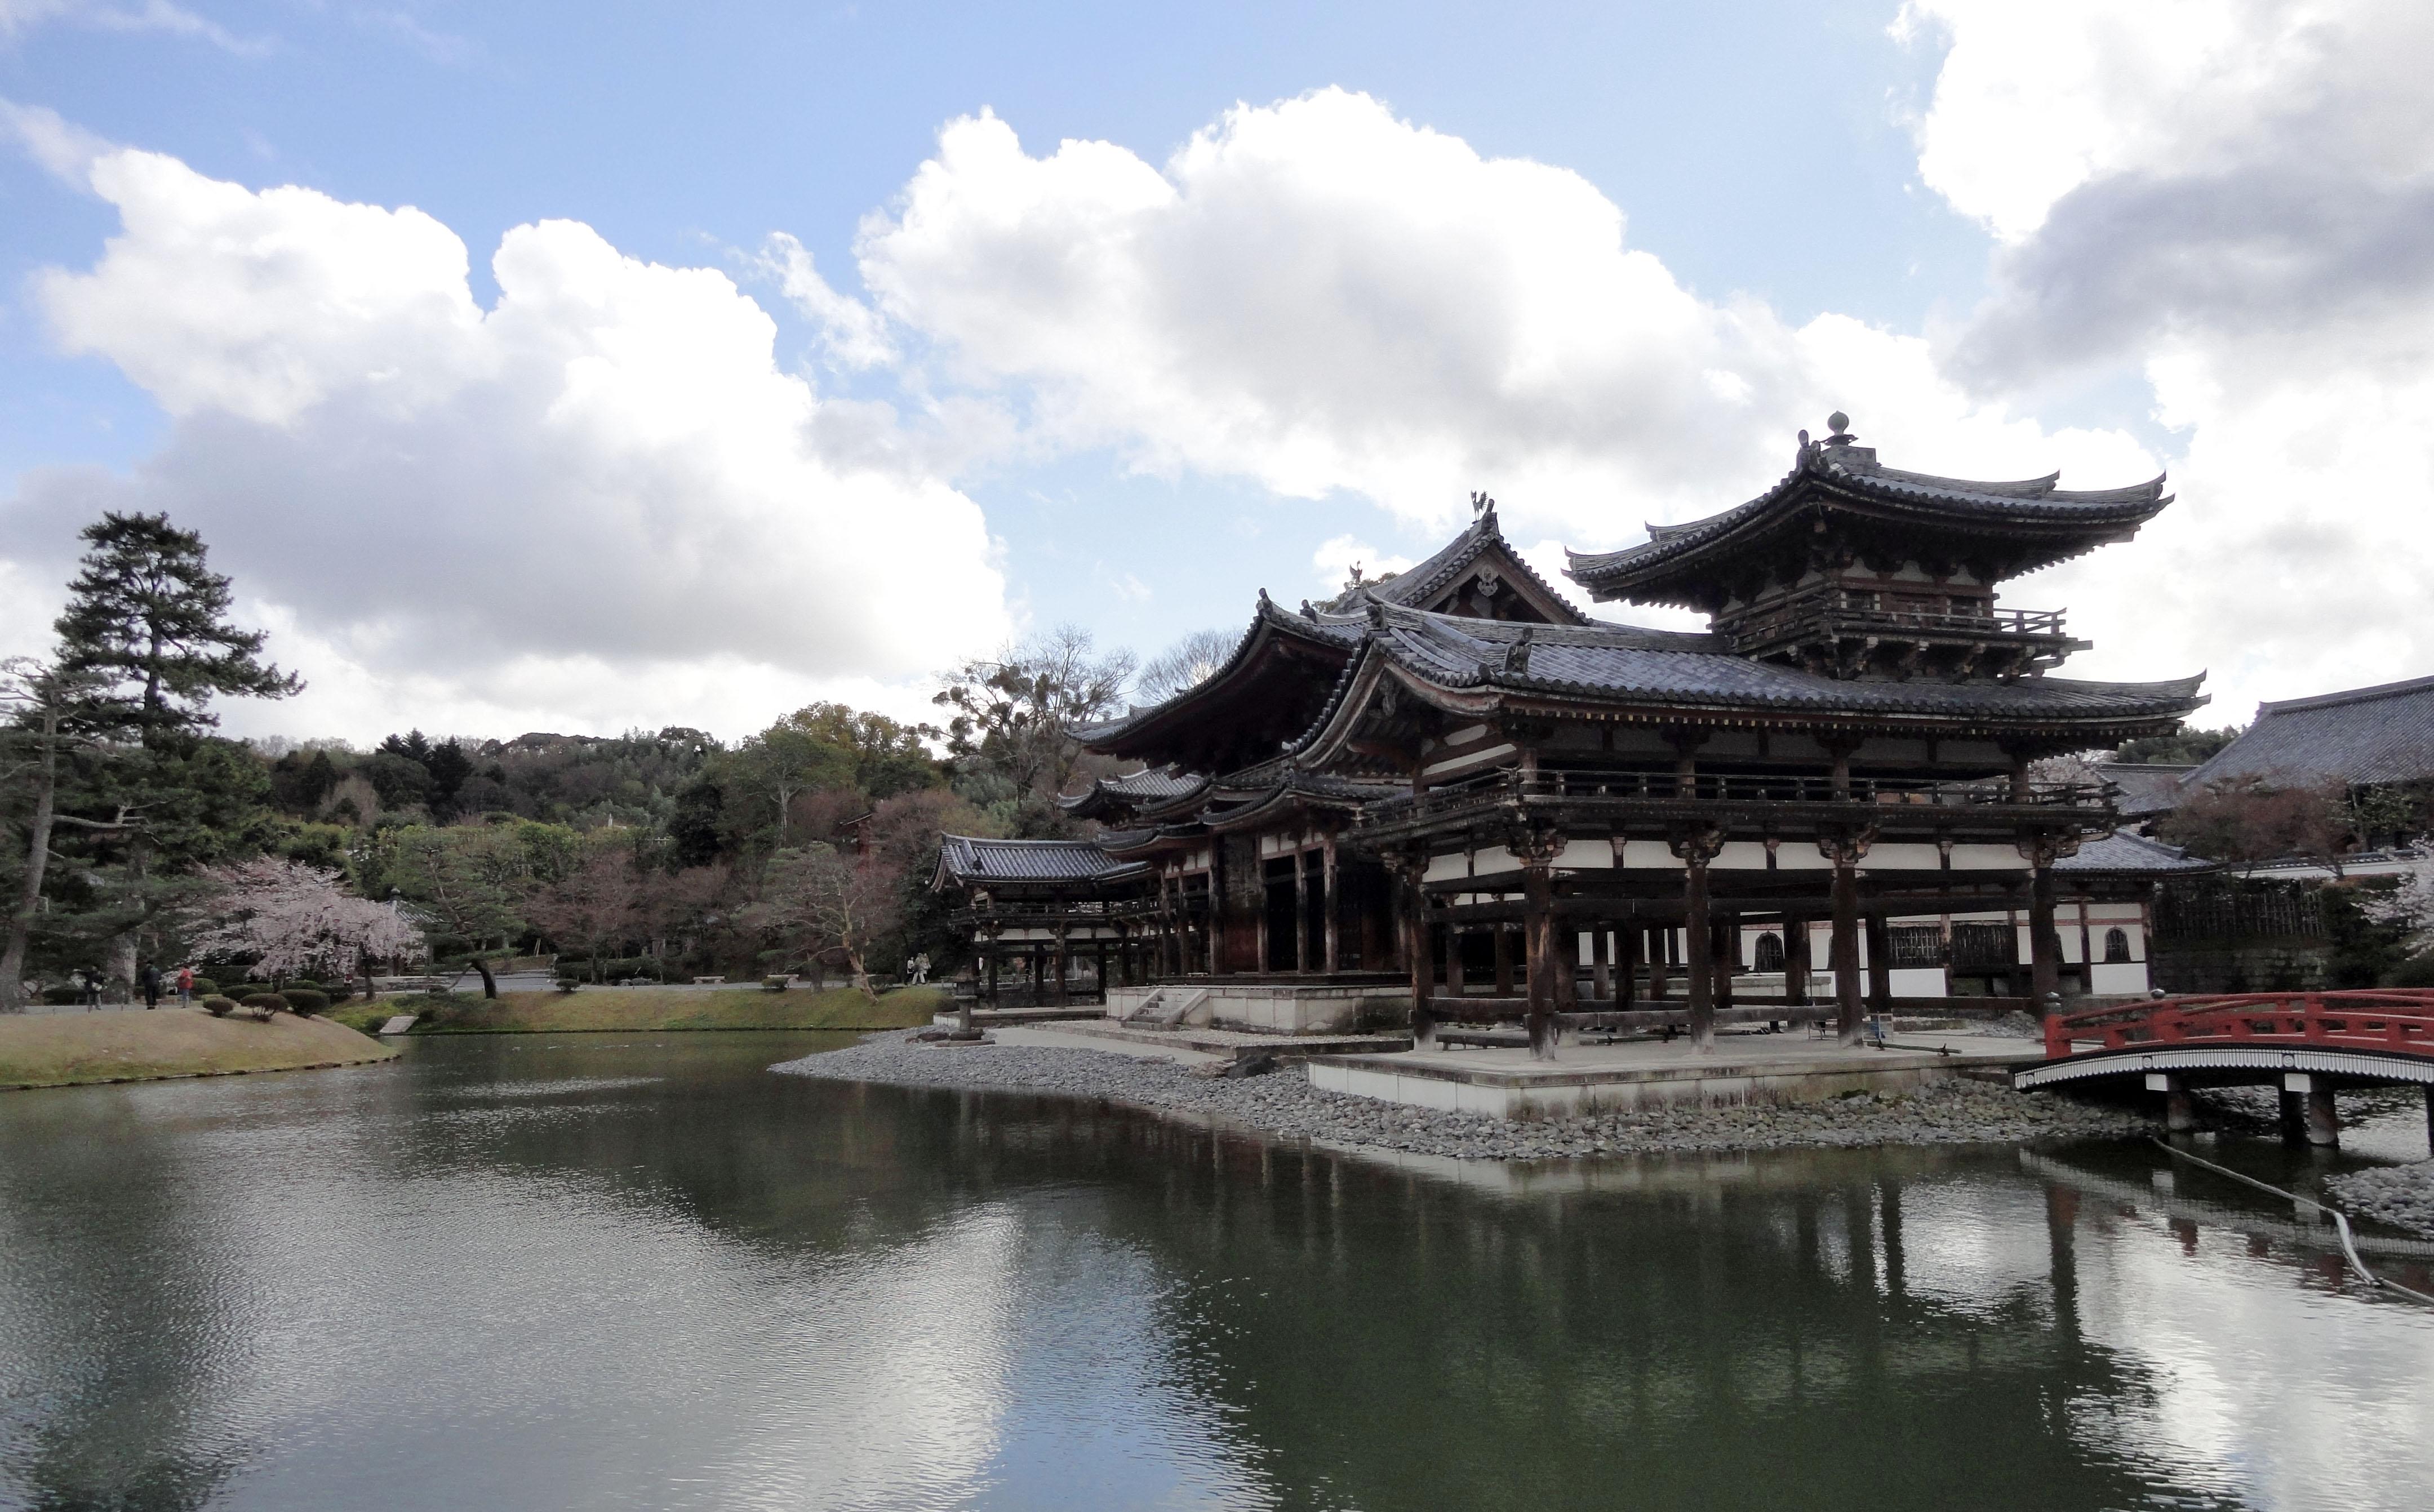 Byodo in temple Phoenix Hall and Jodo shiki garden Kyoto Japan 01